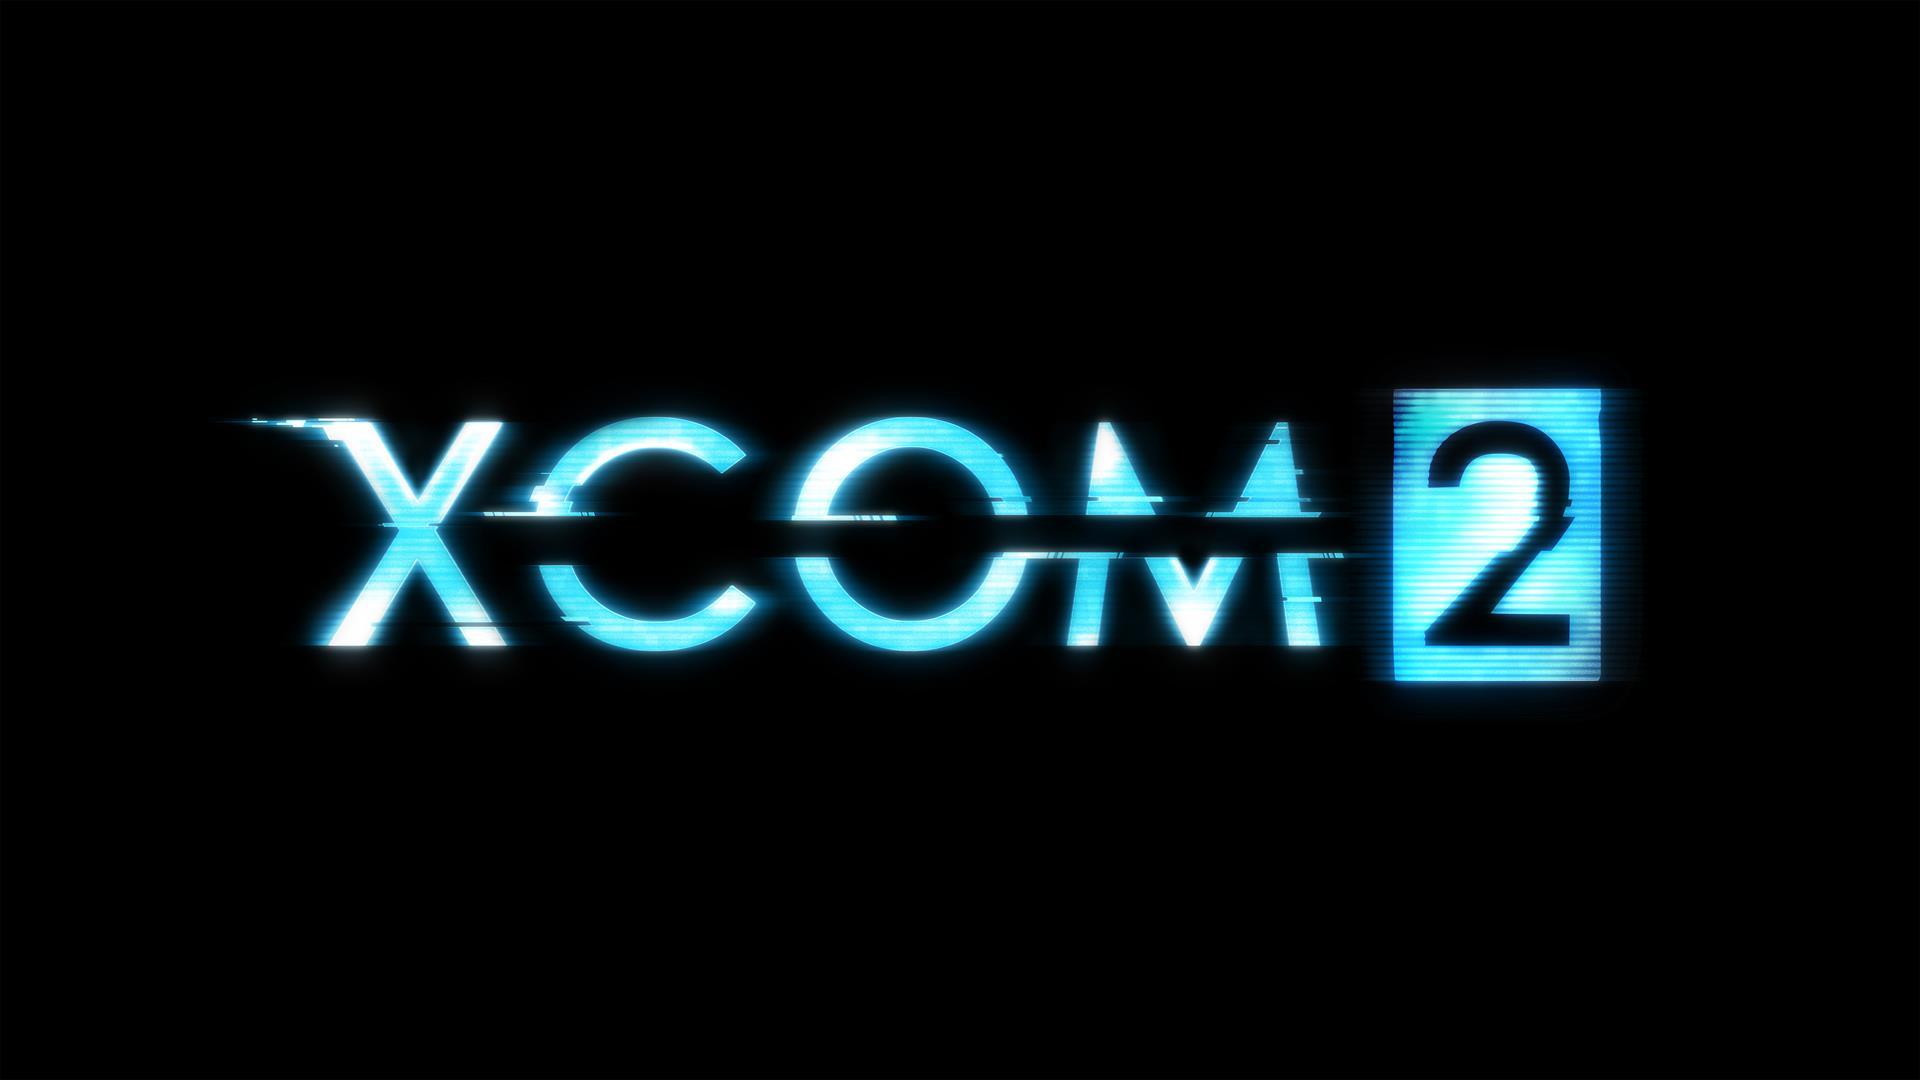 XCOM 2 announced, coming 2015 as a PC exclusive - VG247